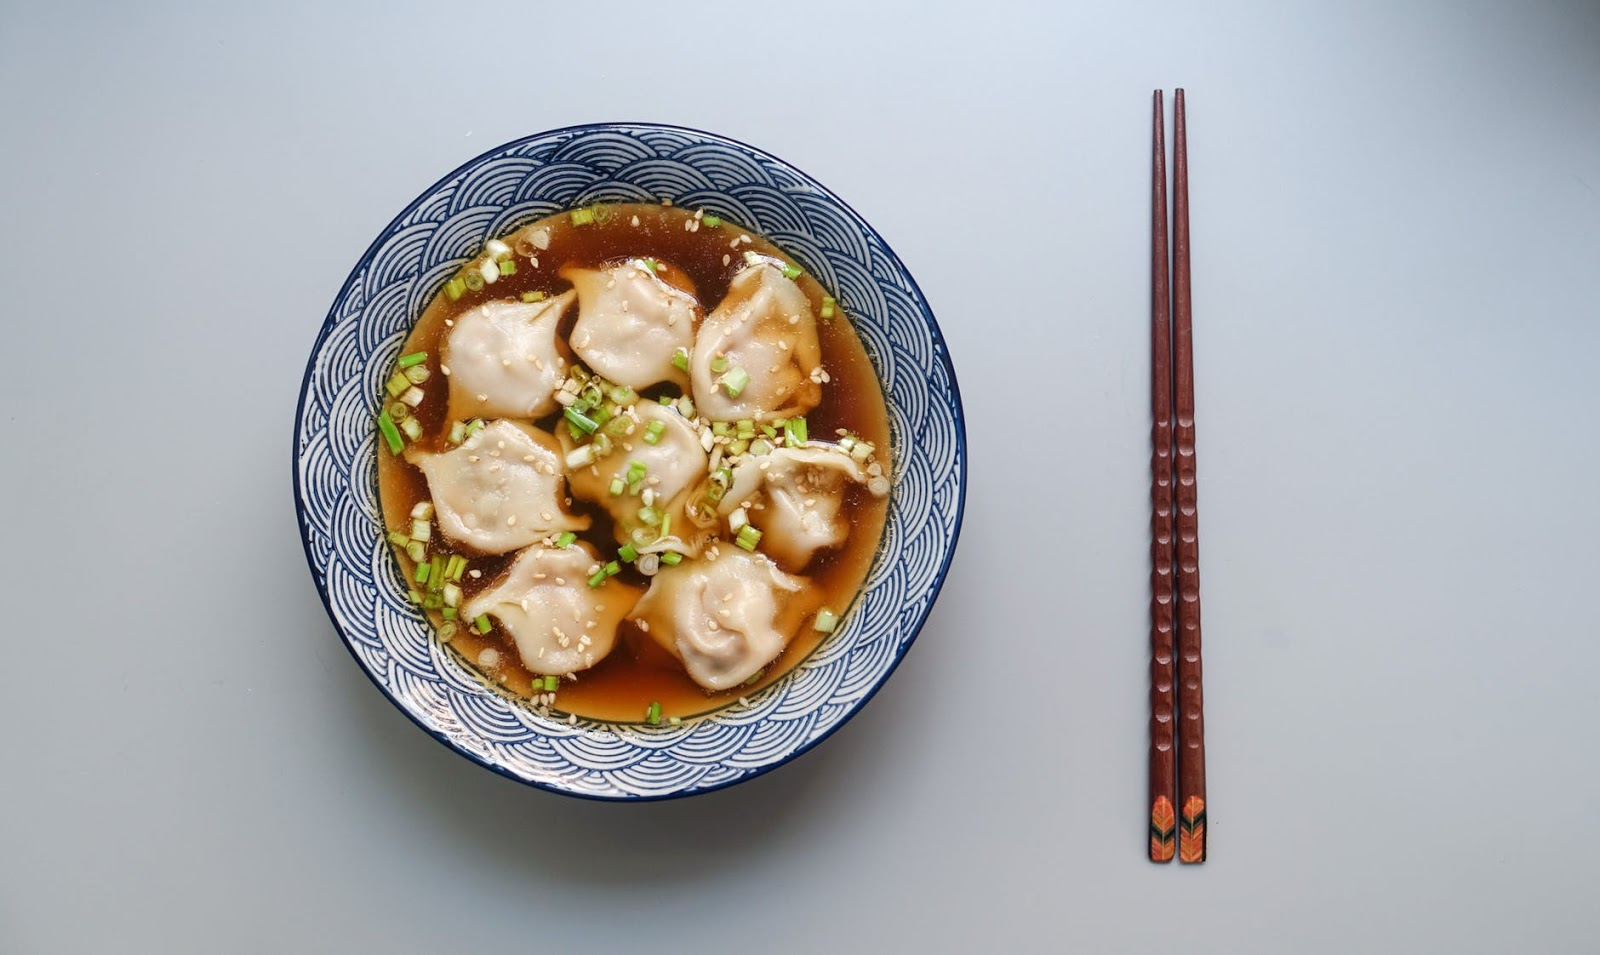 Asian dish on a plate next to chopsticks